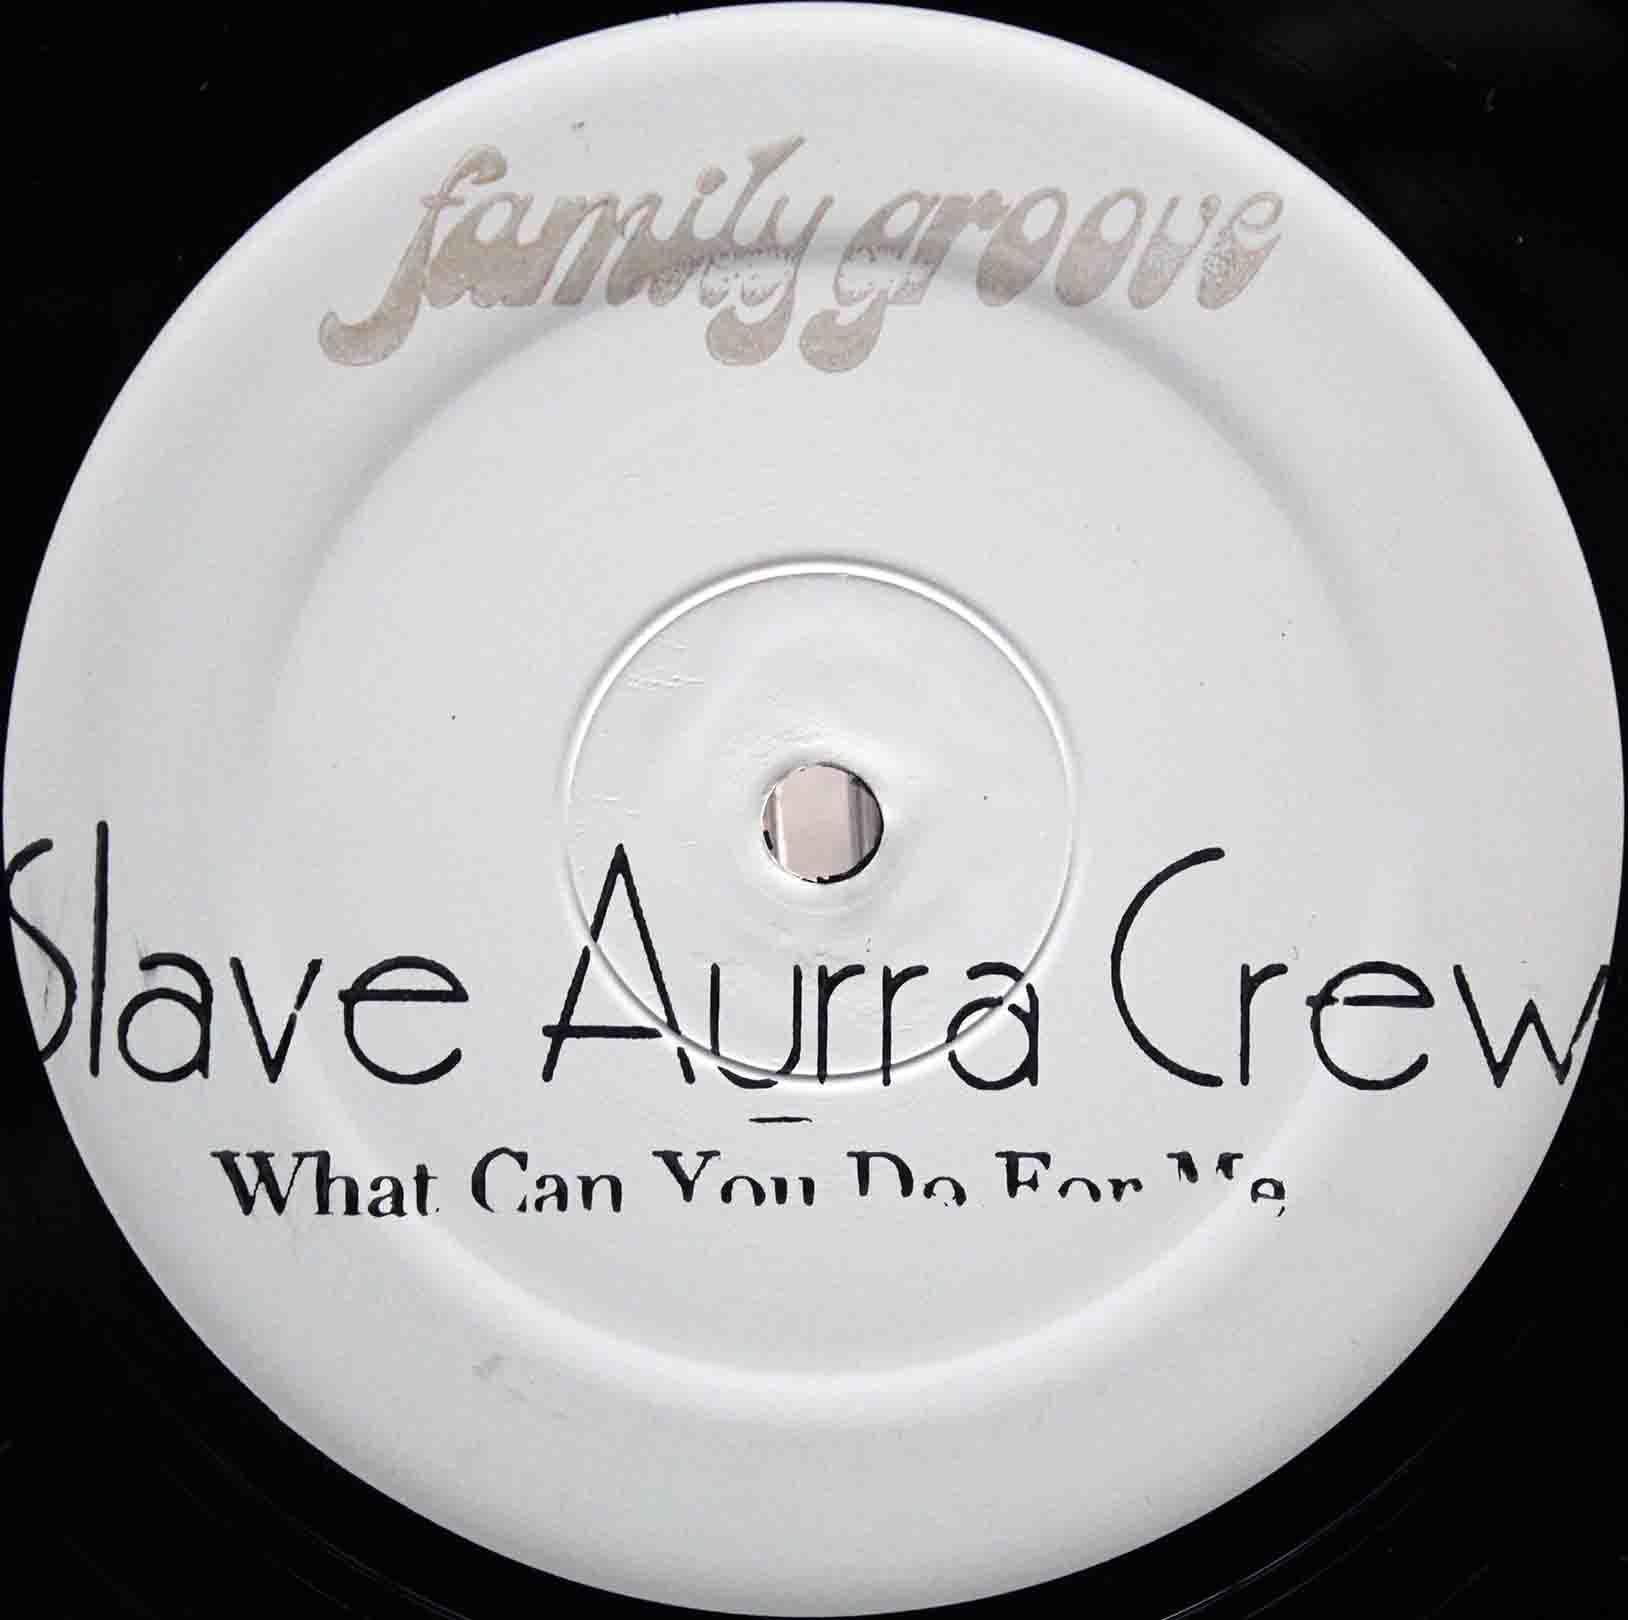 Slave Aurra Crew – Conversation 05